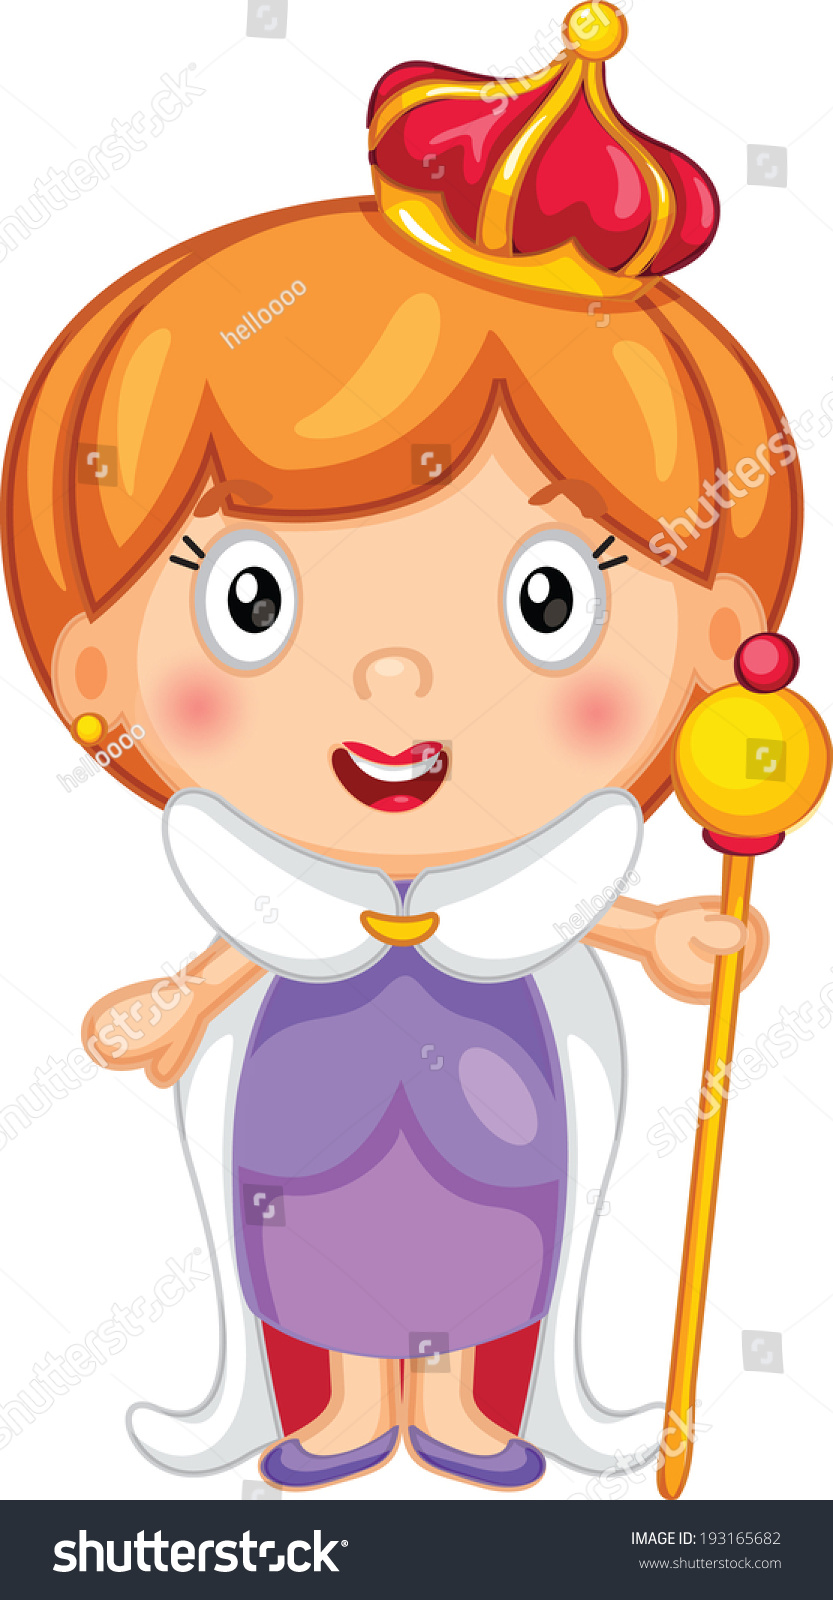 Cartoon Characters That Start With Q : Cute queen cartoon stock vector shutterstock